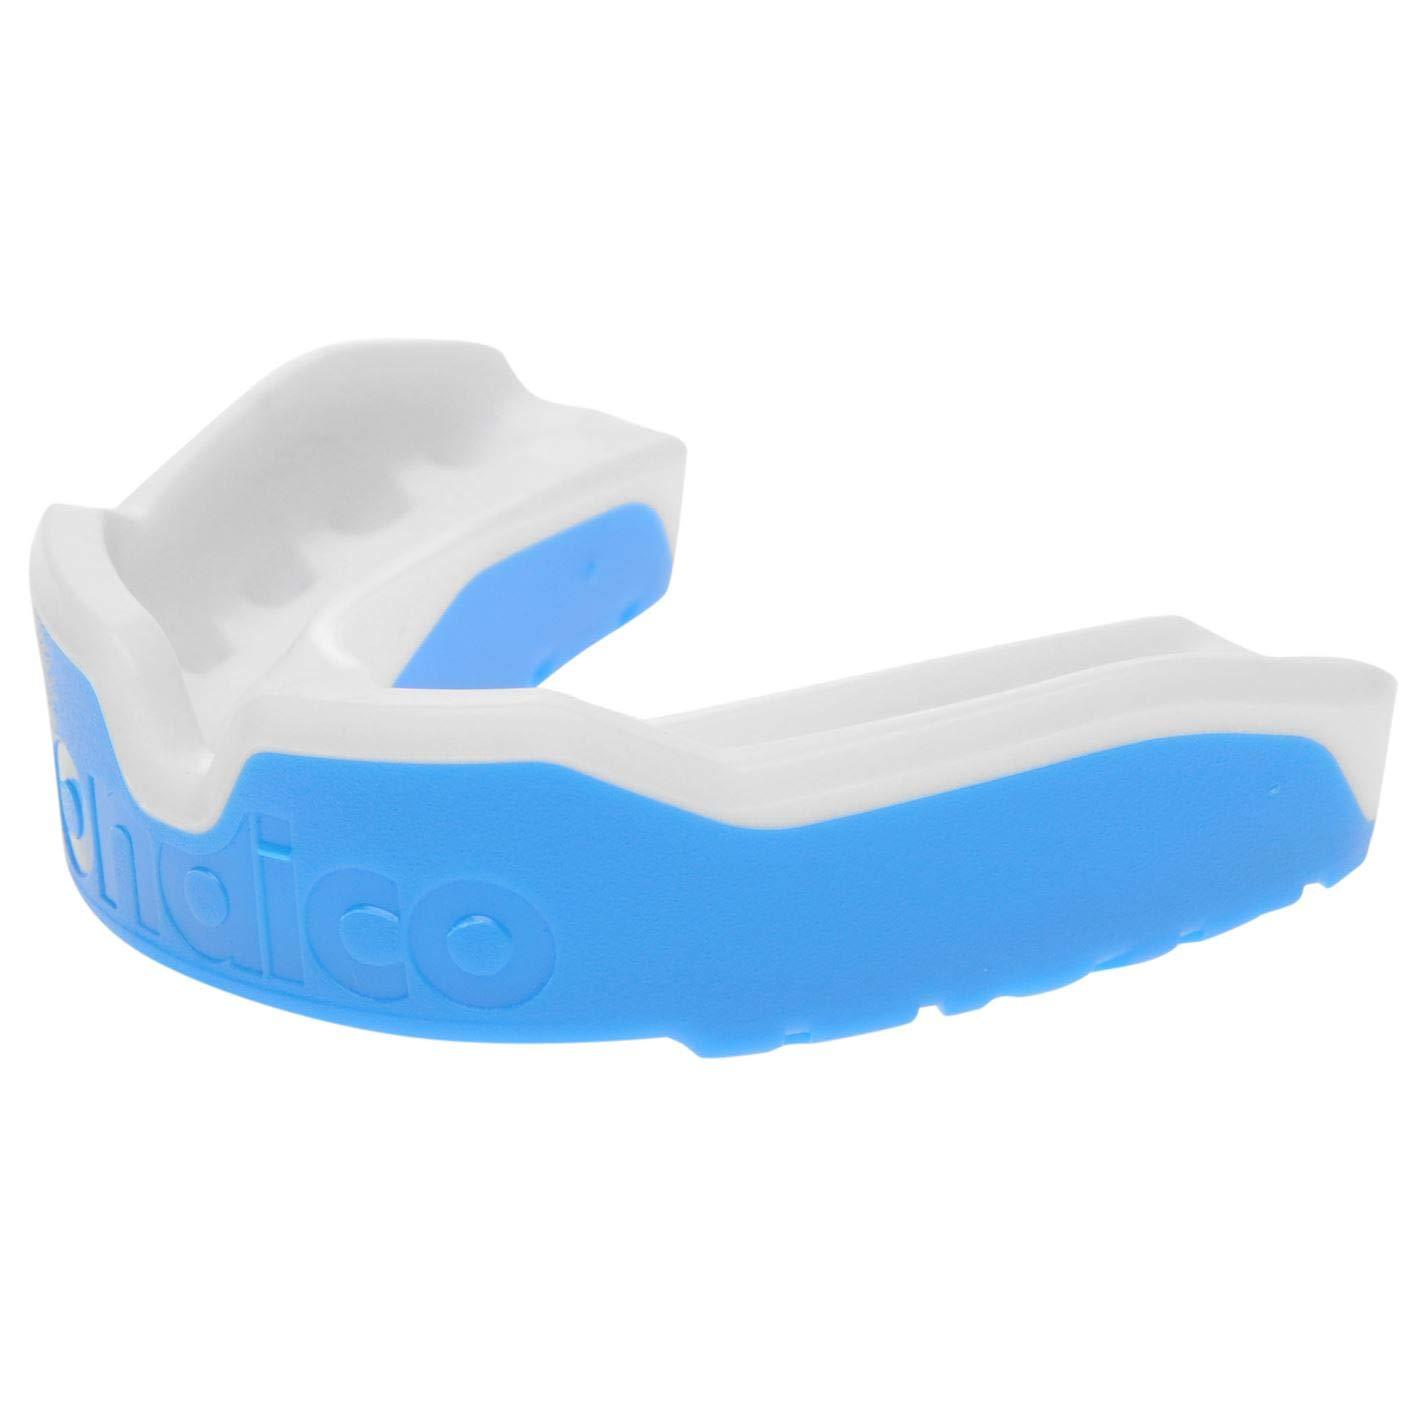 Sondico Unisex Ergo Fusion Mouthguard